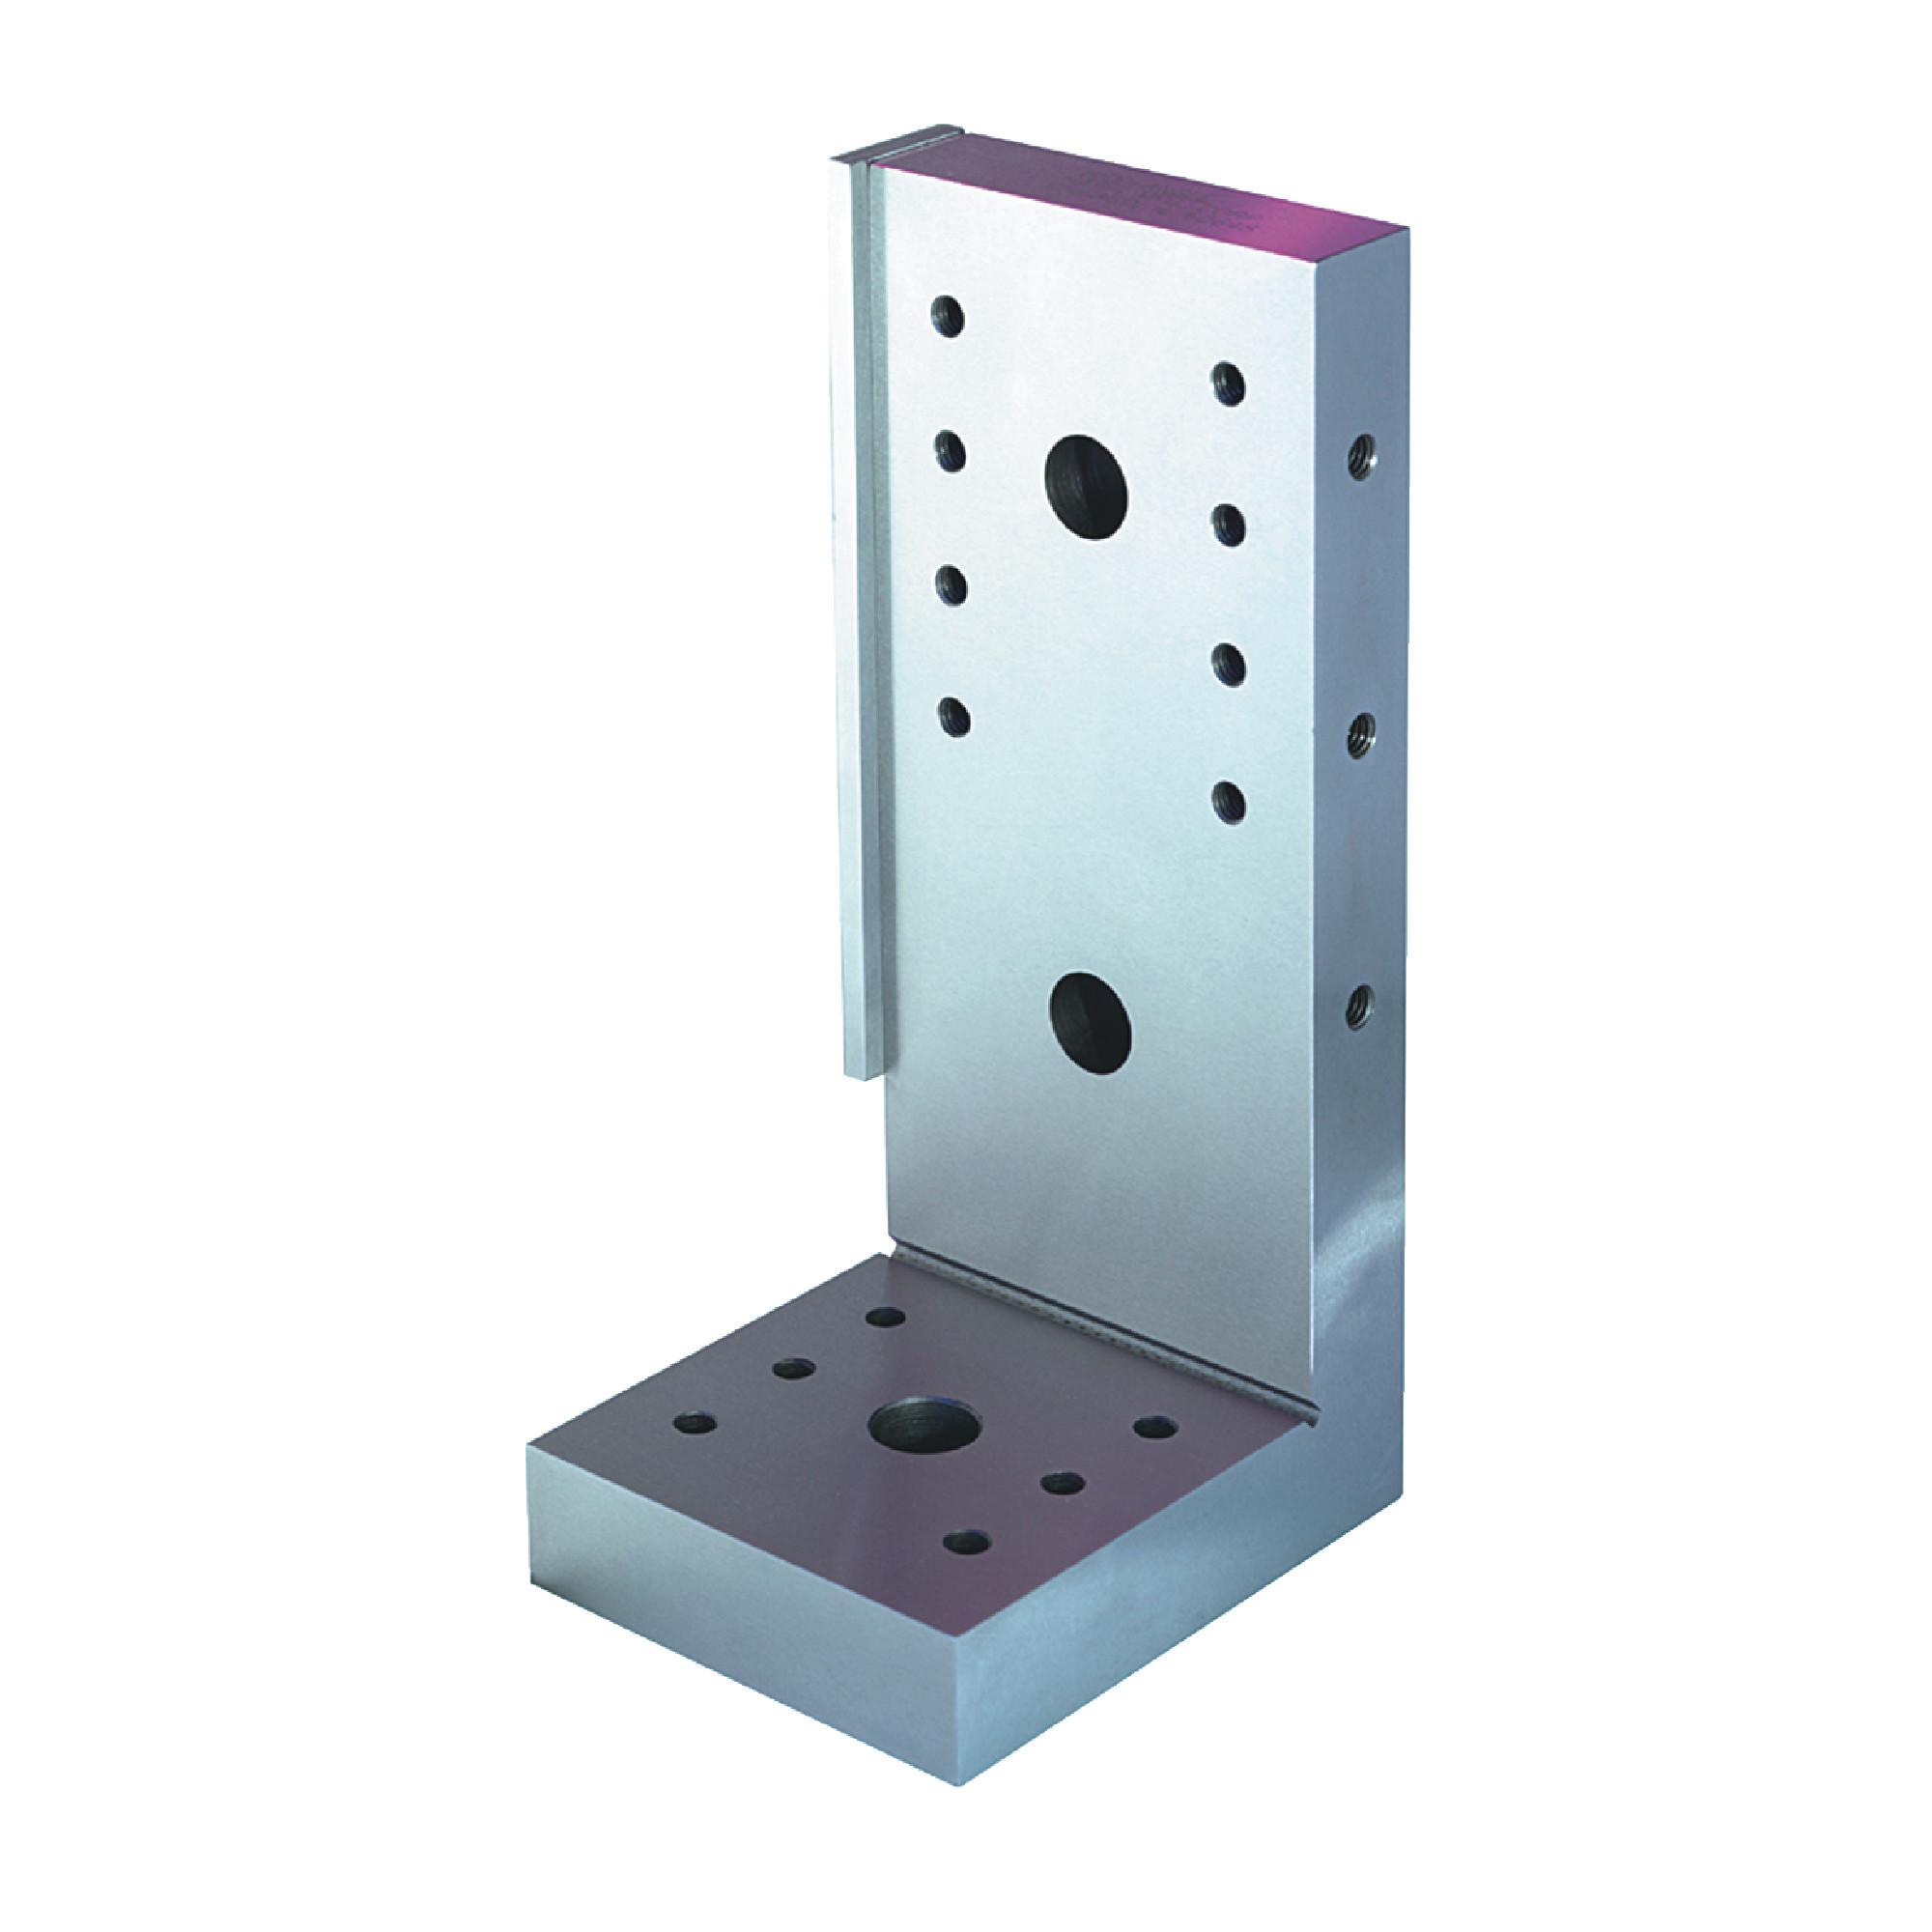 Hite Angle Plate w/rail for Ultra Grind #5C-V